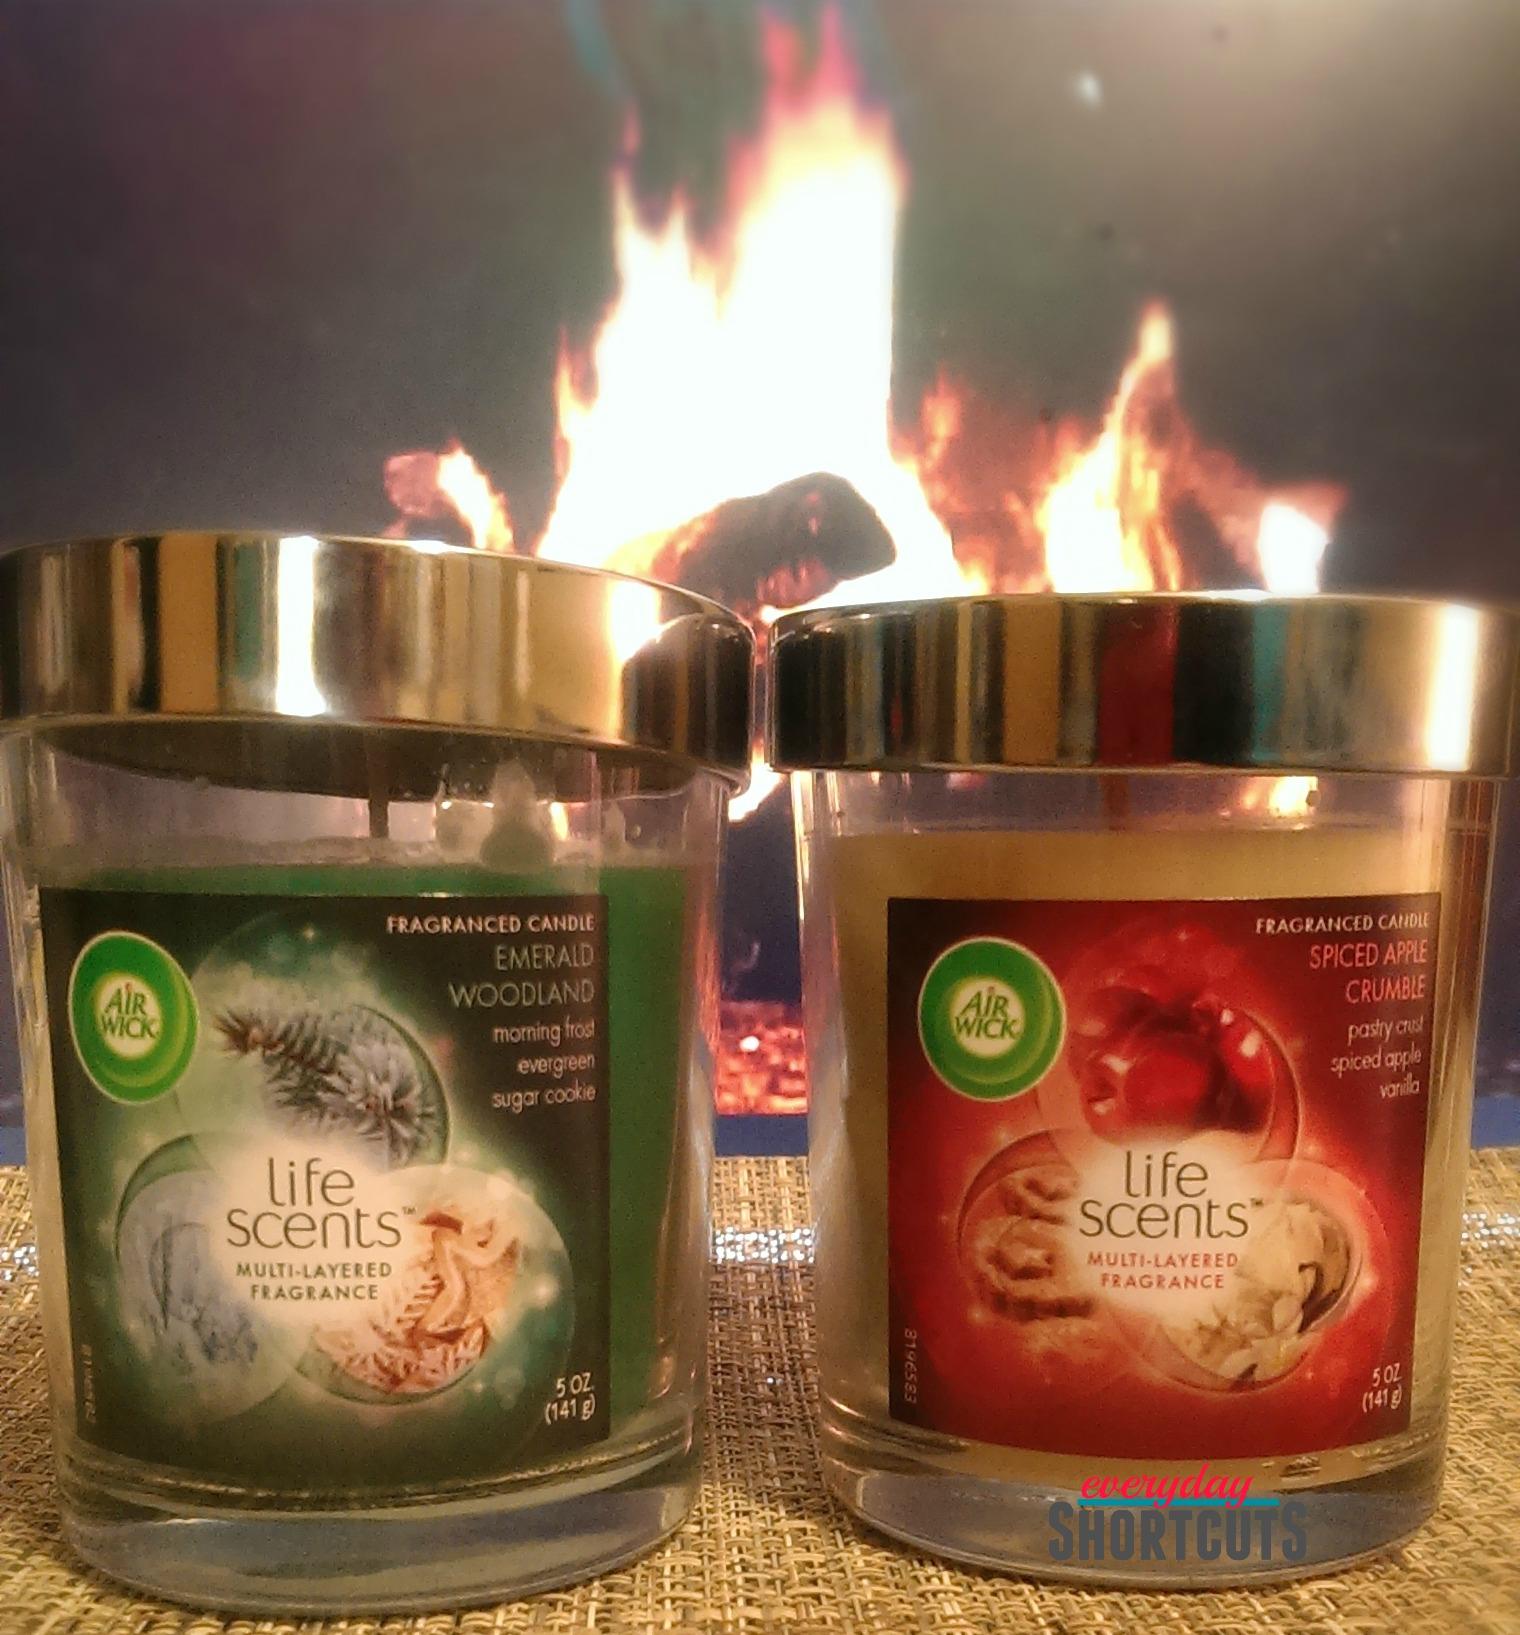 life scents